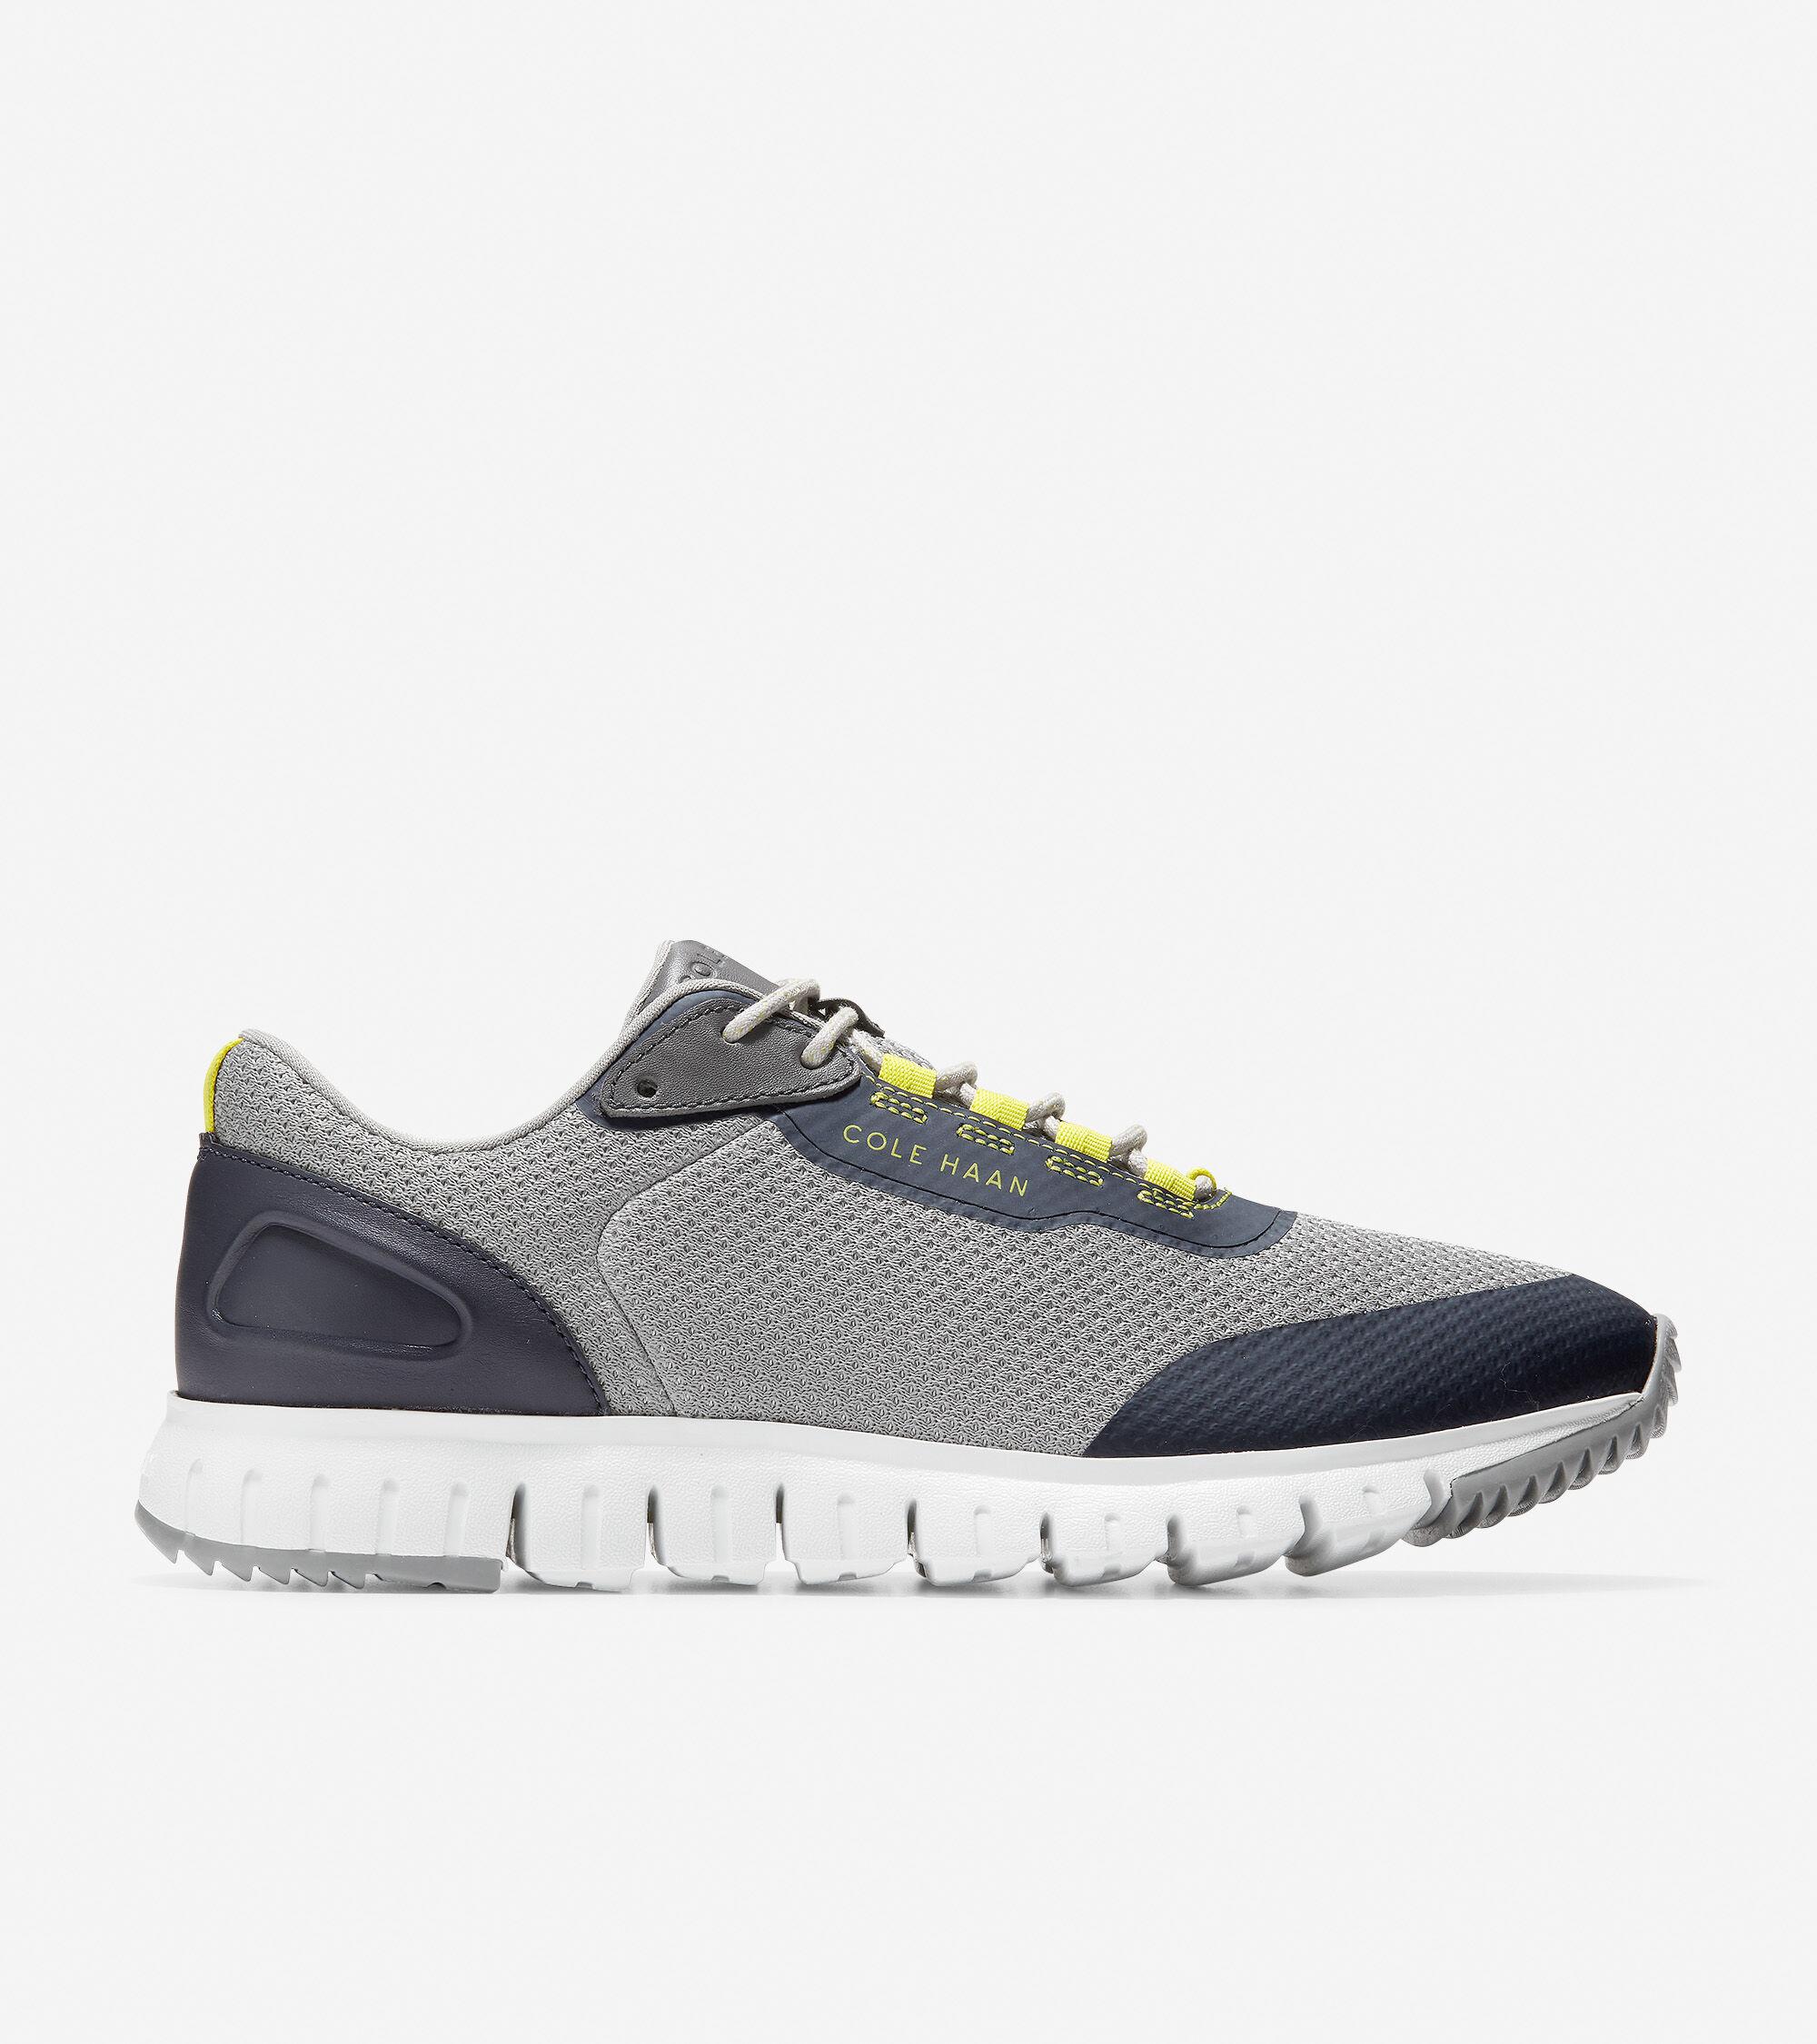 Grandsport Flex Sneaker in Sleet Grey